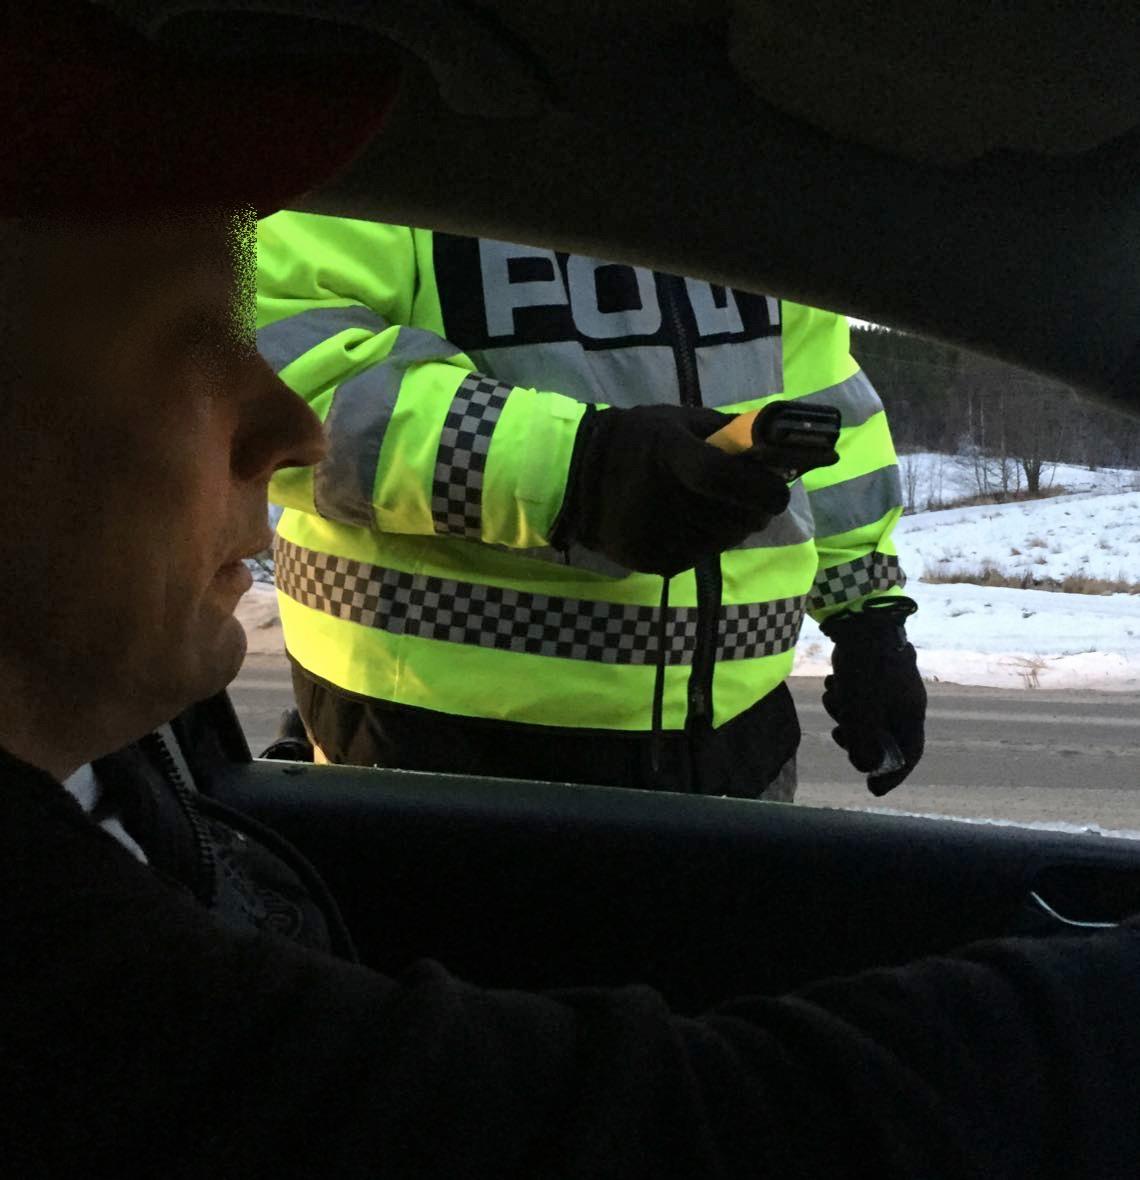 politi-gjennom-bilvindu-kontroll-1.jpg